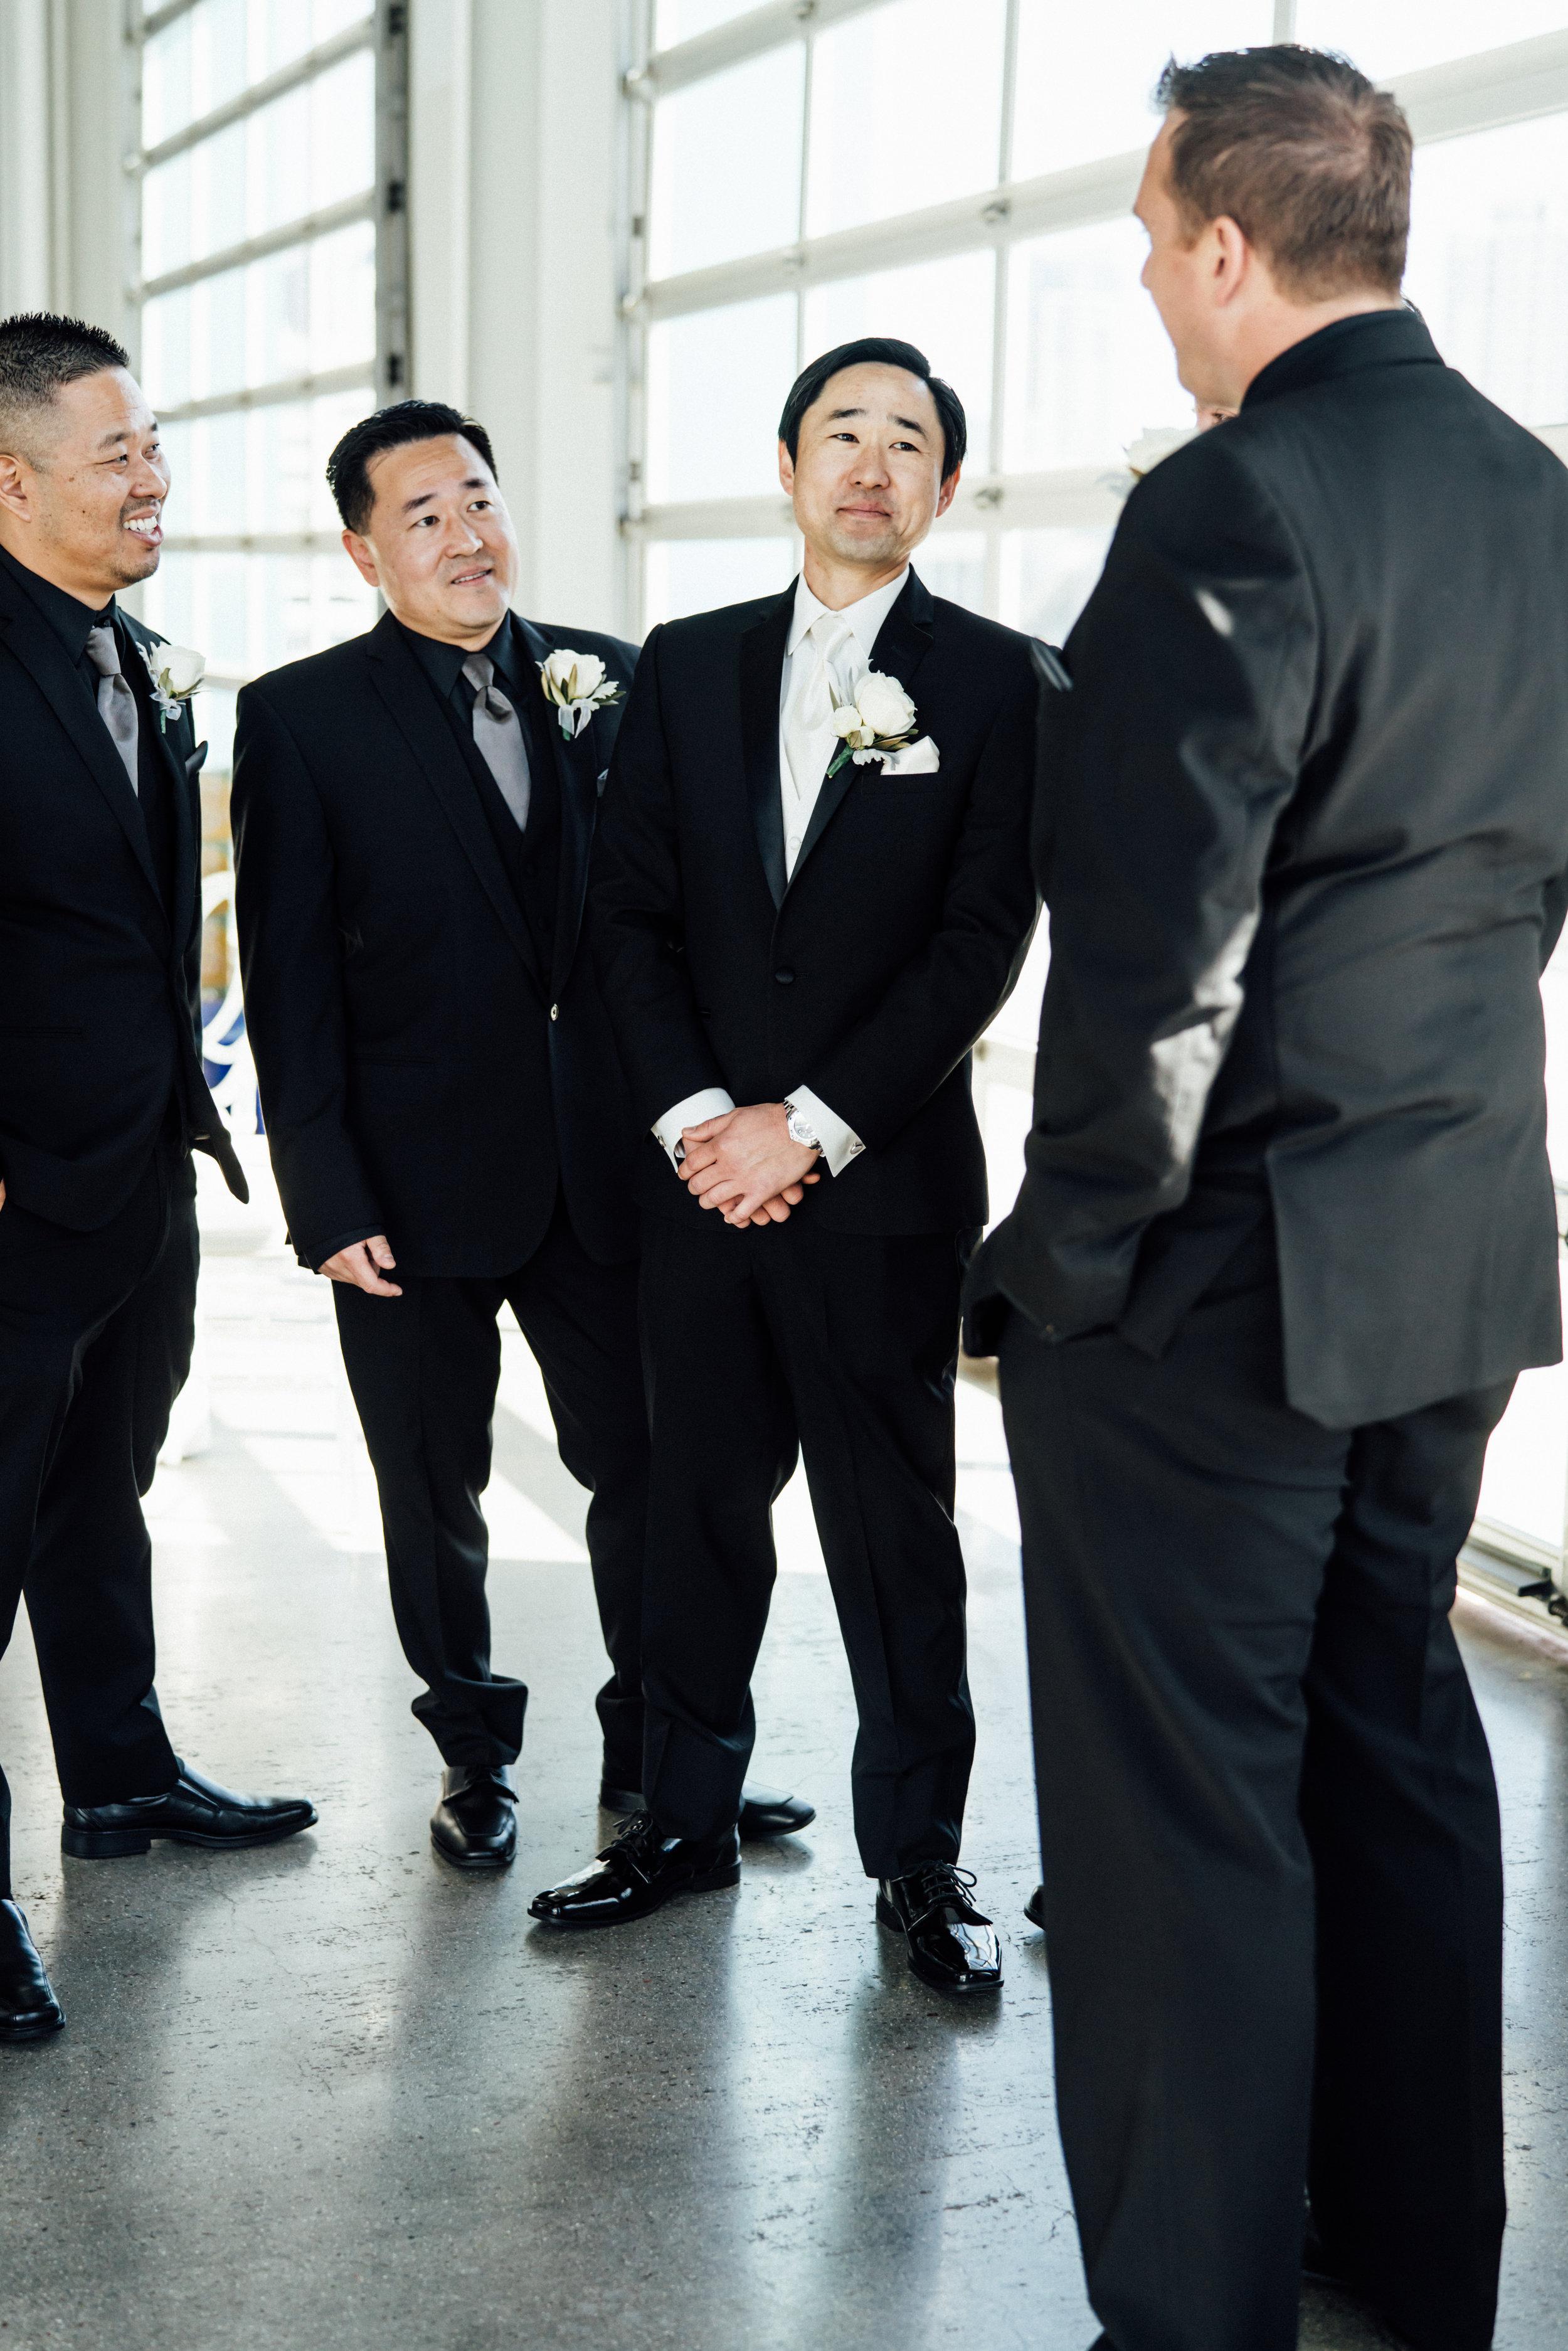 241 Anna _ Danny Wedding DSC07623.jpg